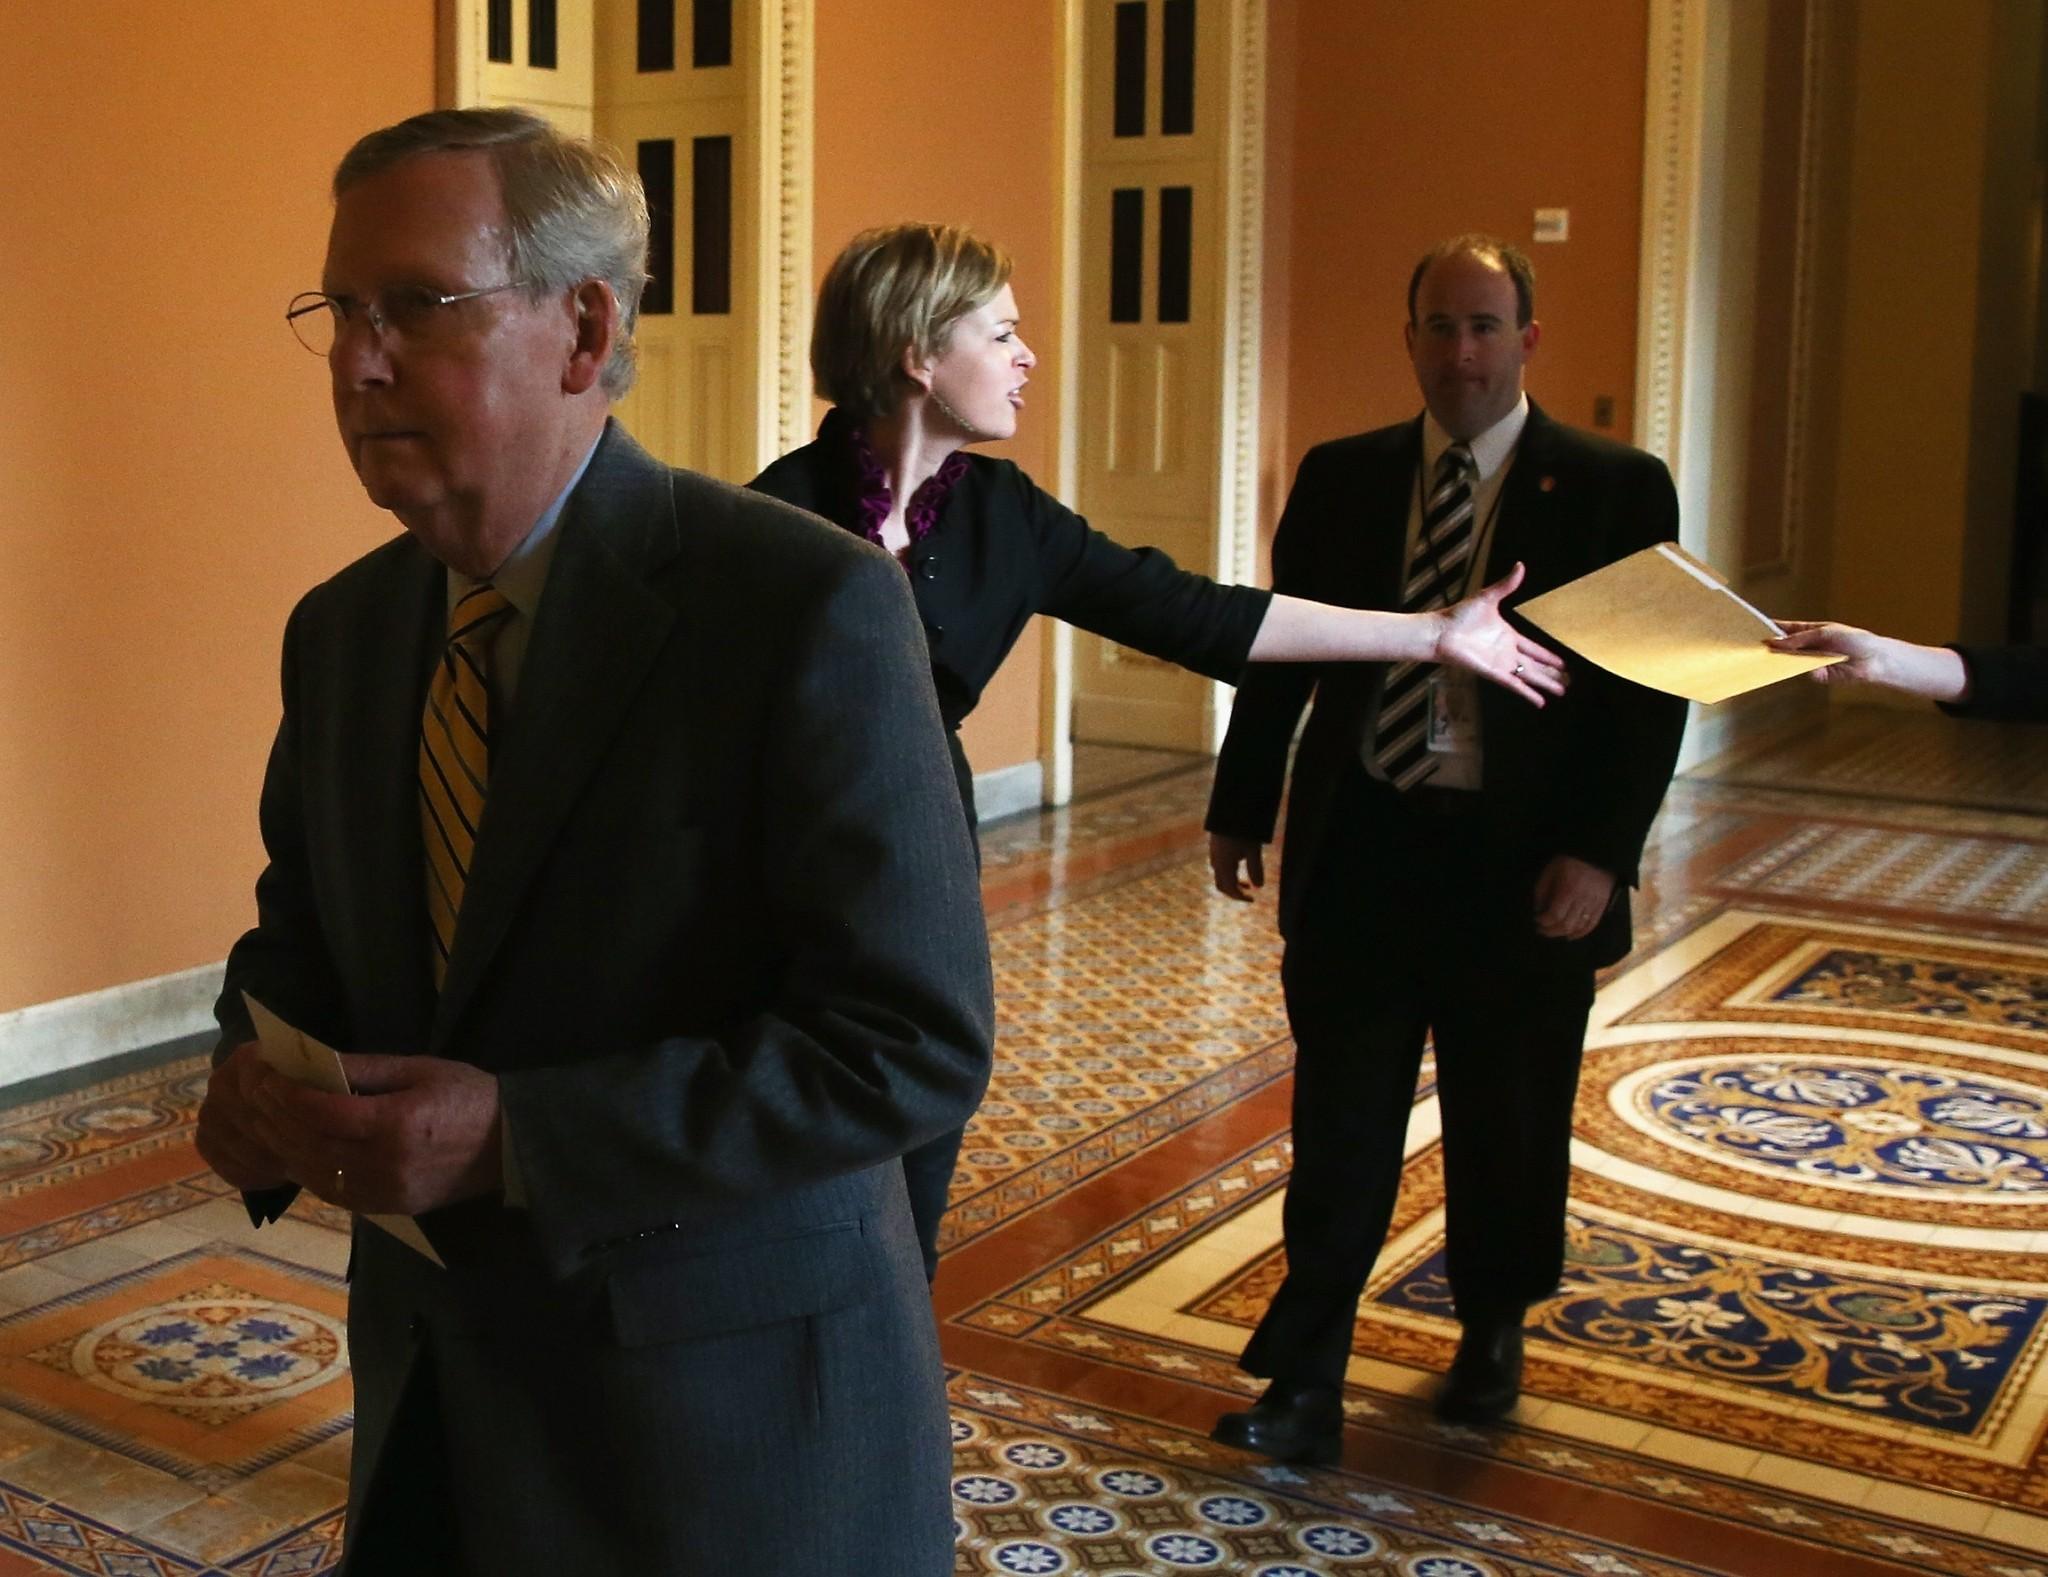 Senate to take up historic Medicare bill after recess